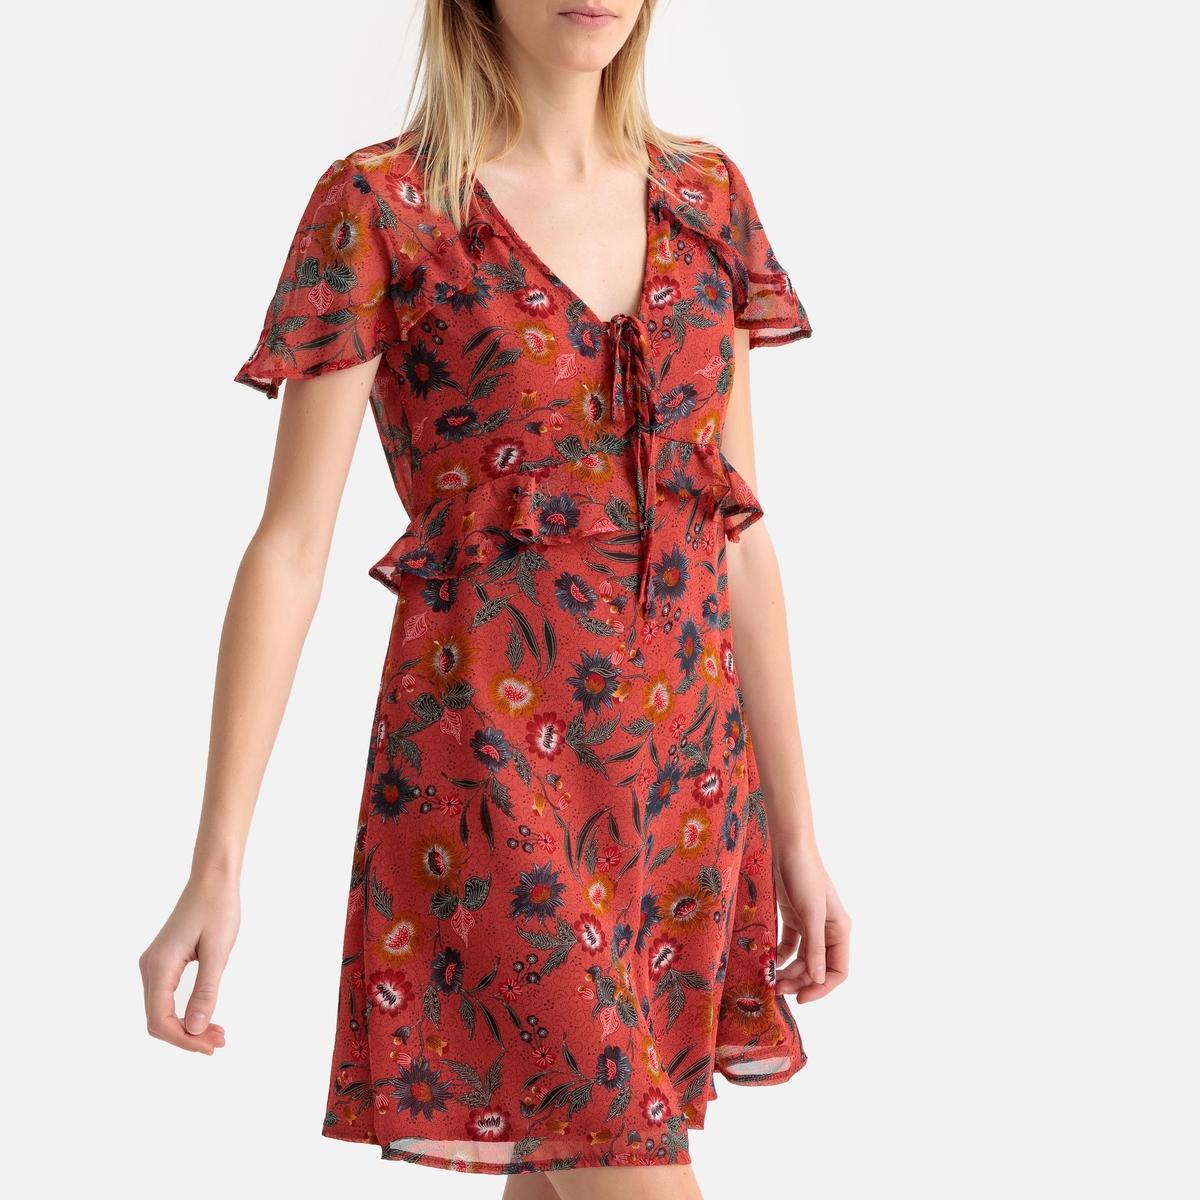 Платье La Redoute С цветочным рисунком короткими рукавами и воланами на груди S оранжевый black cover piano guitar music for iphone x xr xs max for iphone 8 7 6 6s plus 5s 5 se super bright glossy phone case